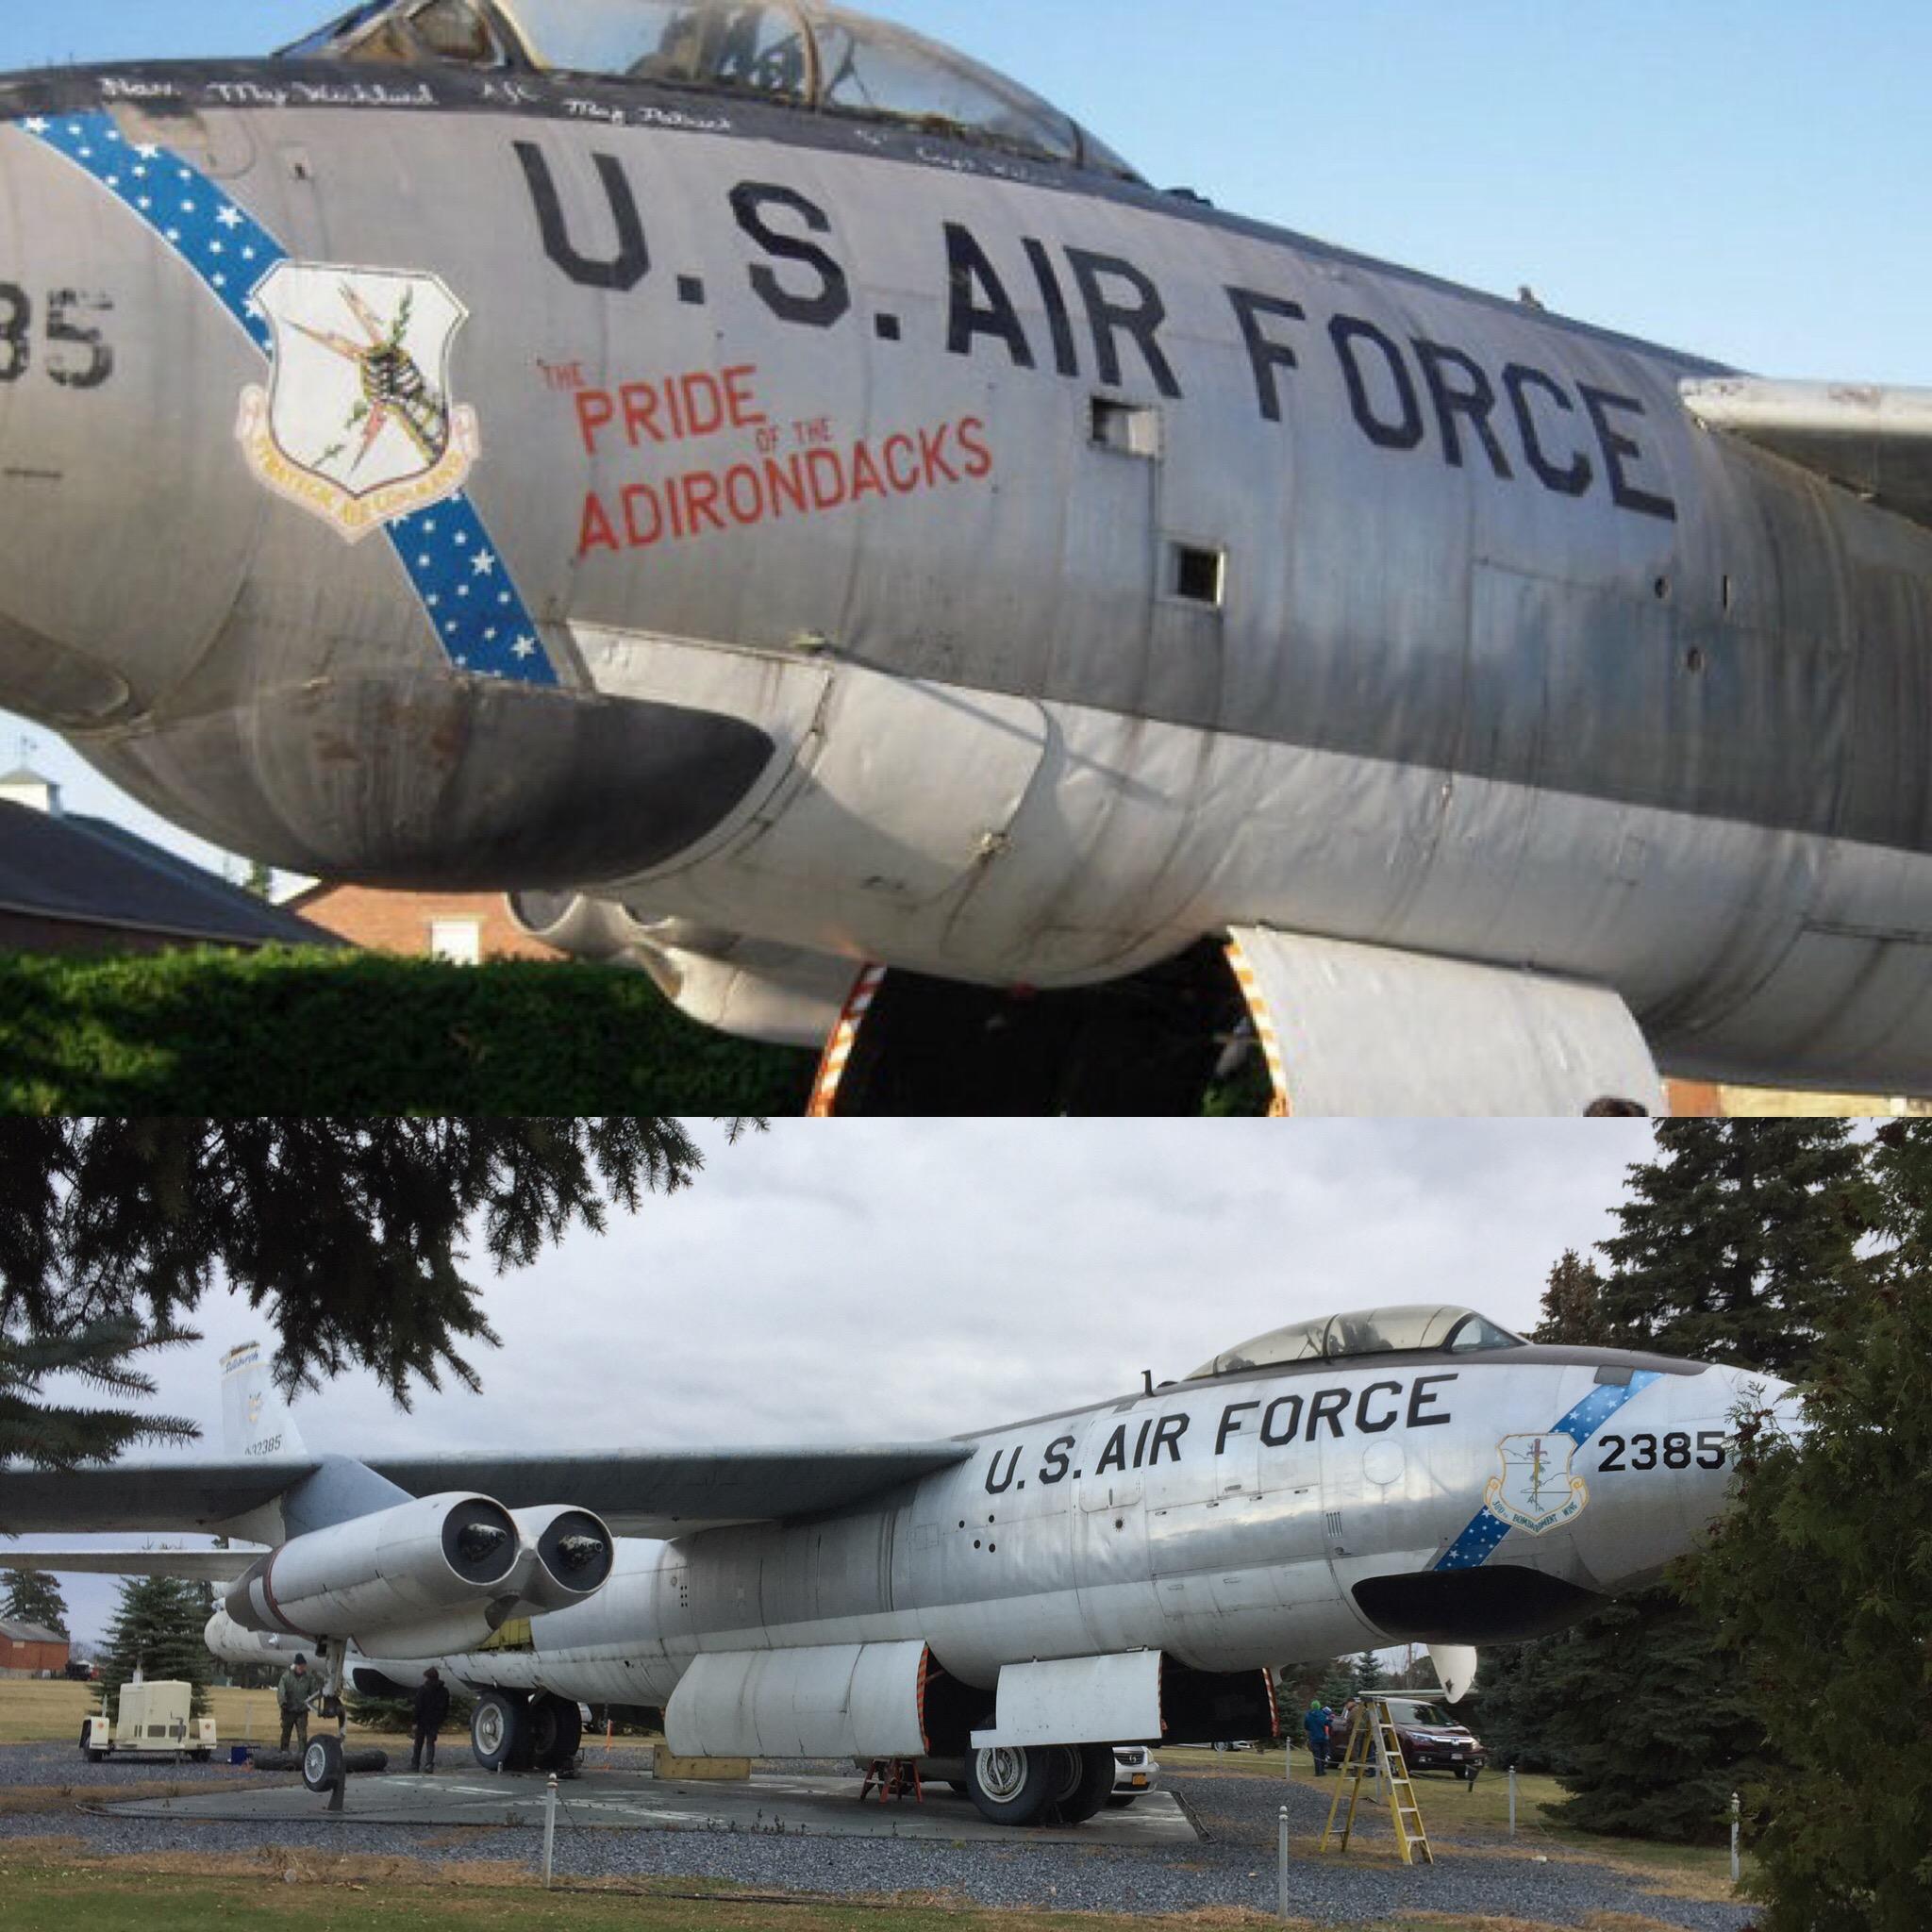 Pride of the Adirondacks B-47 0-32385